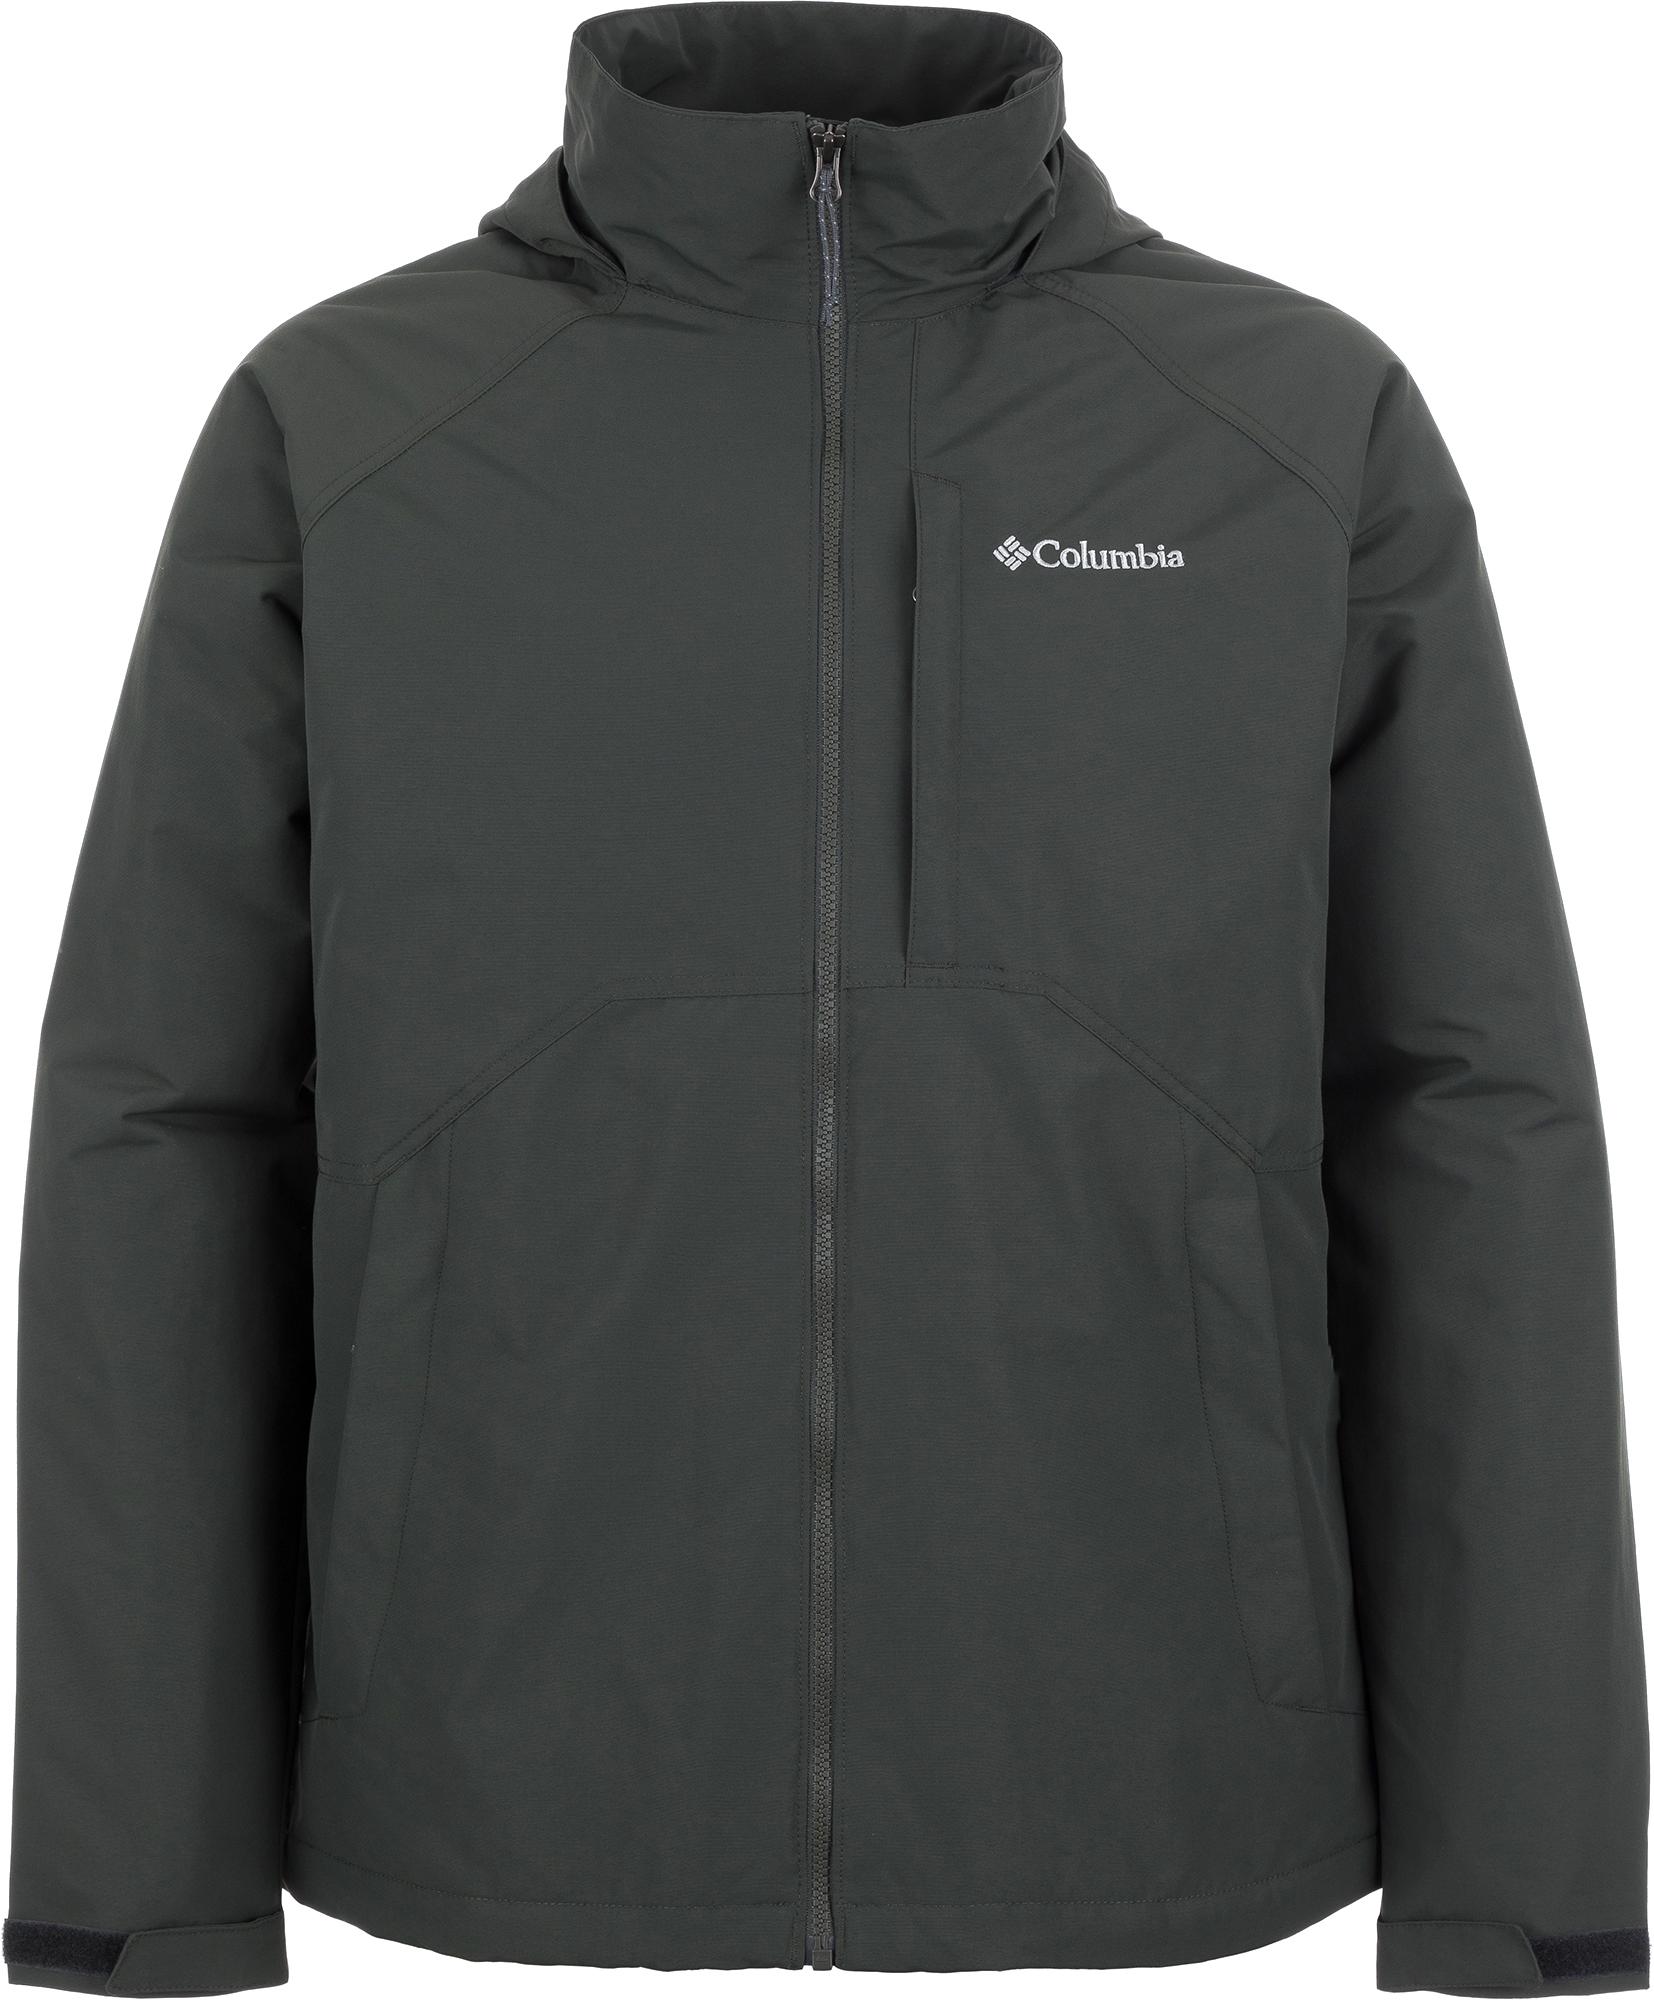 Columbia Куртка утепленная мужская Columbia Columbus Creek Insulated, размер 52-54 куртка мужская geox цвет темно синий m8220kt2447f4386 размер 54